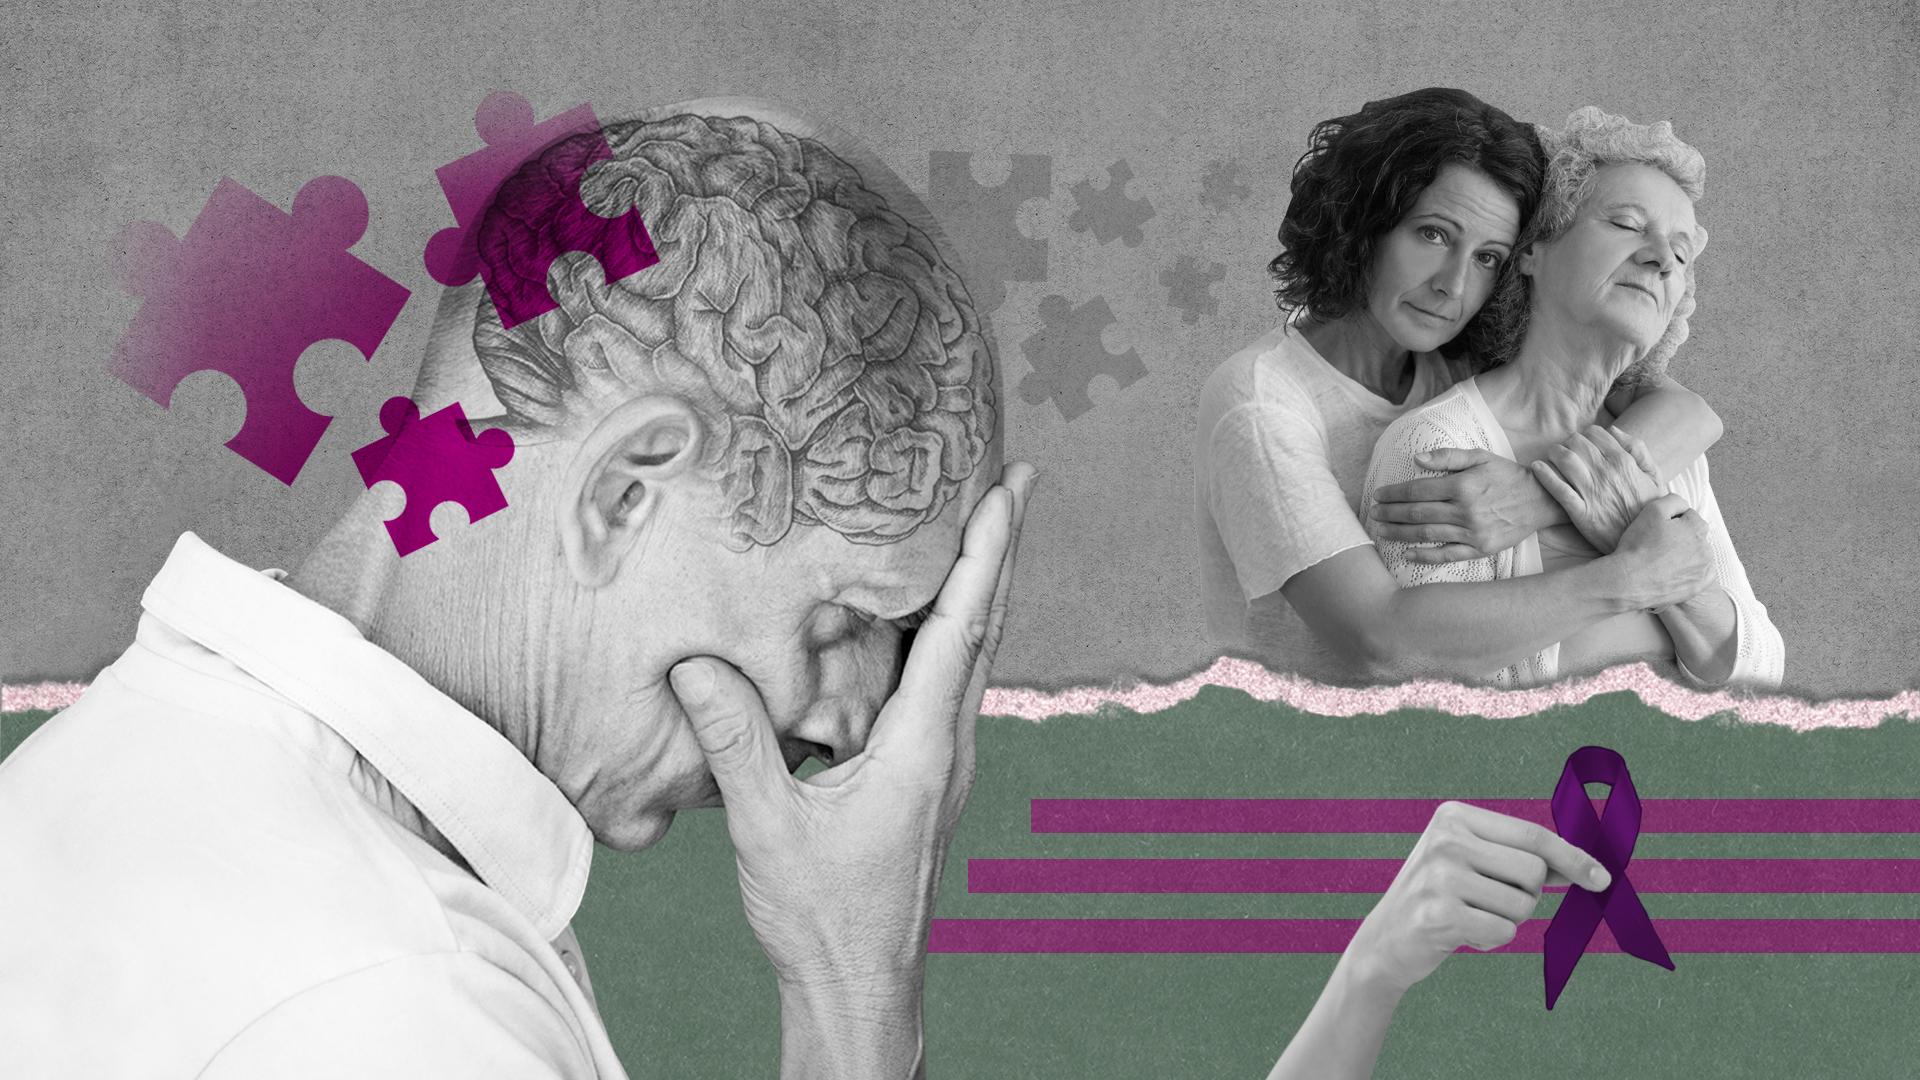 Cómo acompañar a personas con alzhéimer durante la pandemia